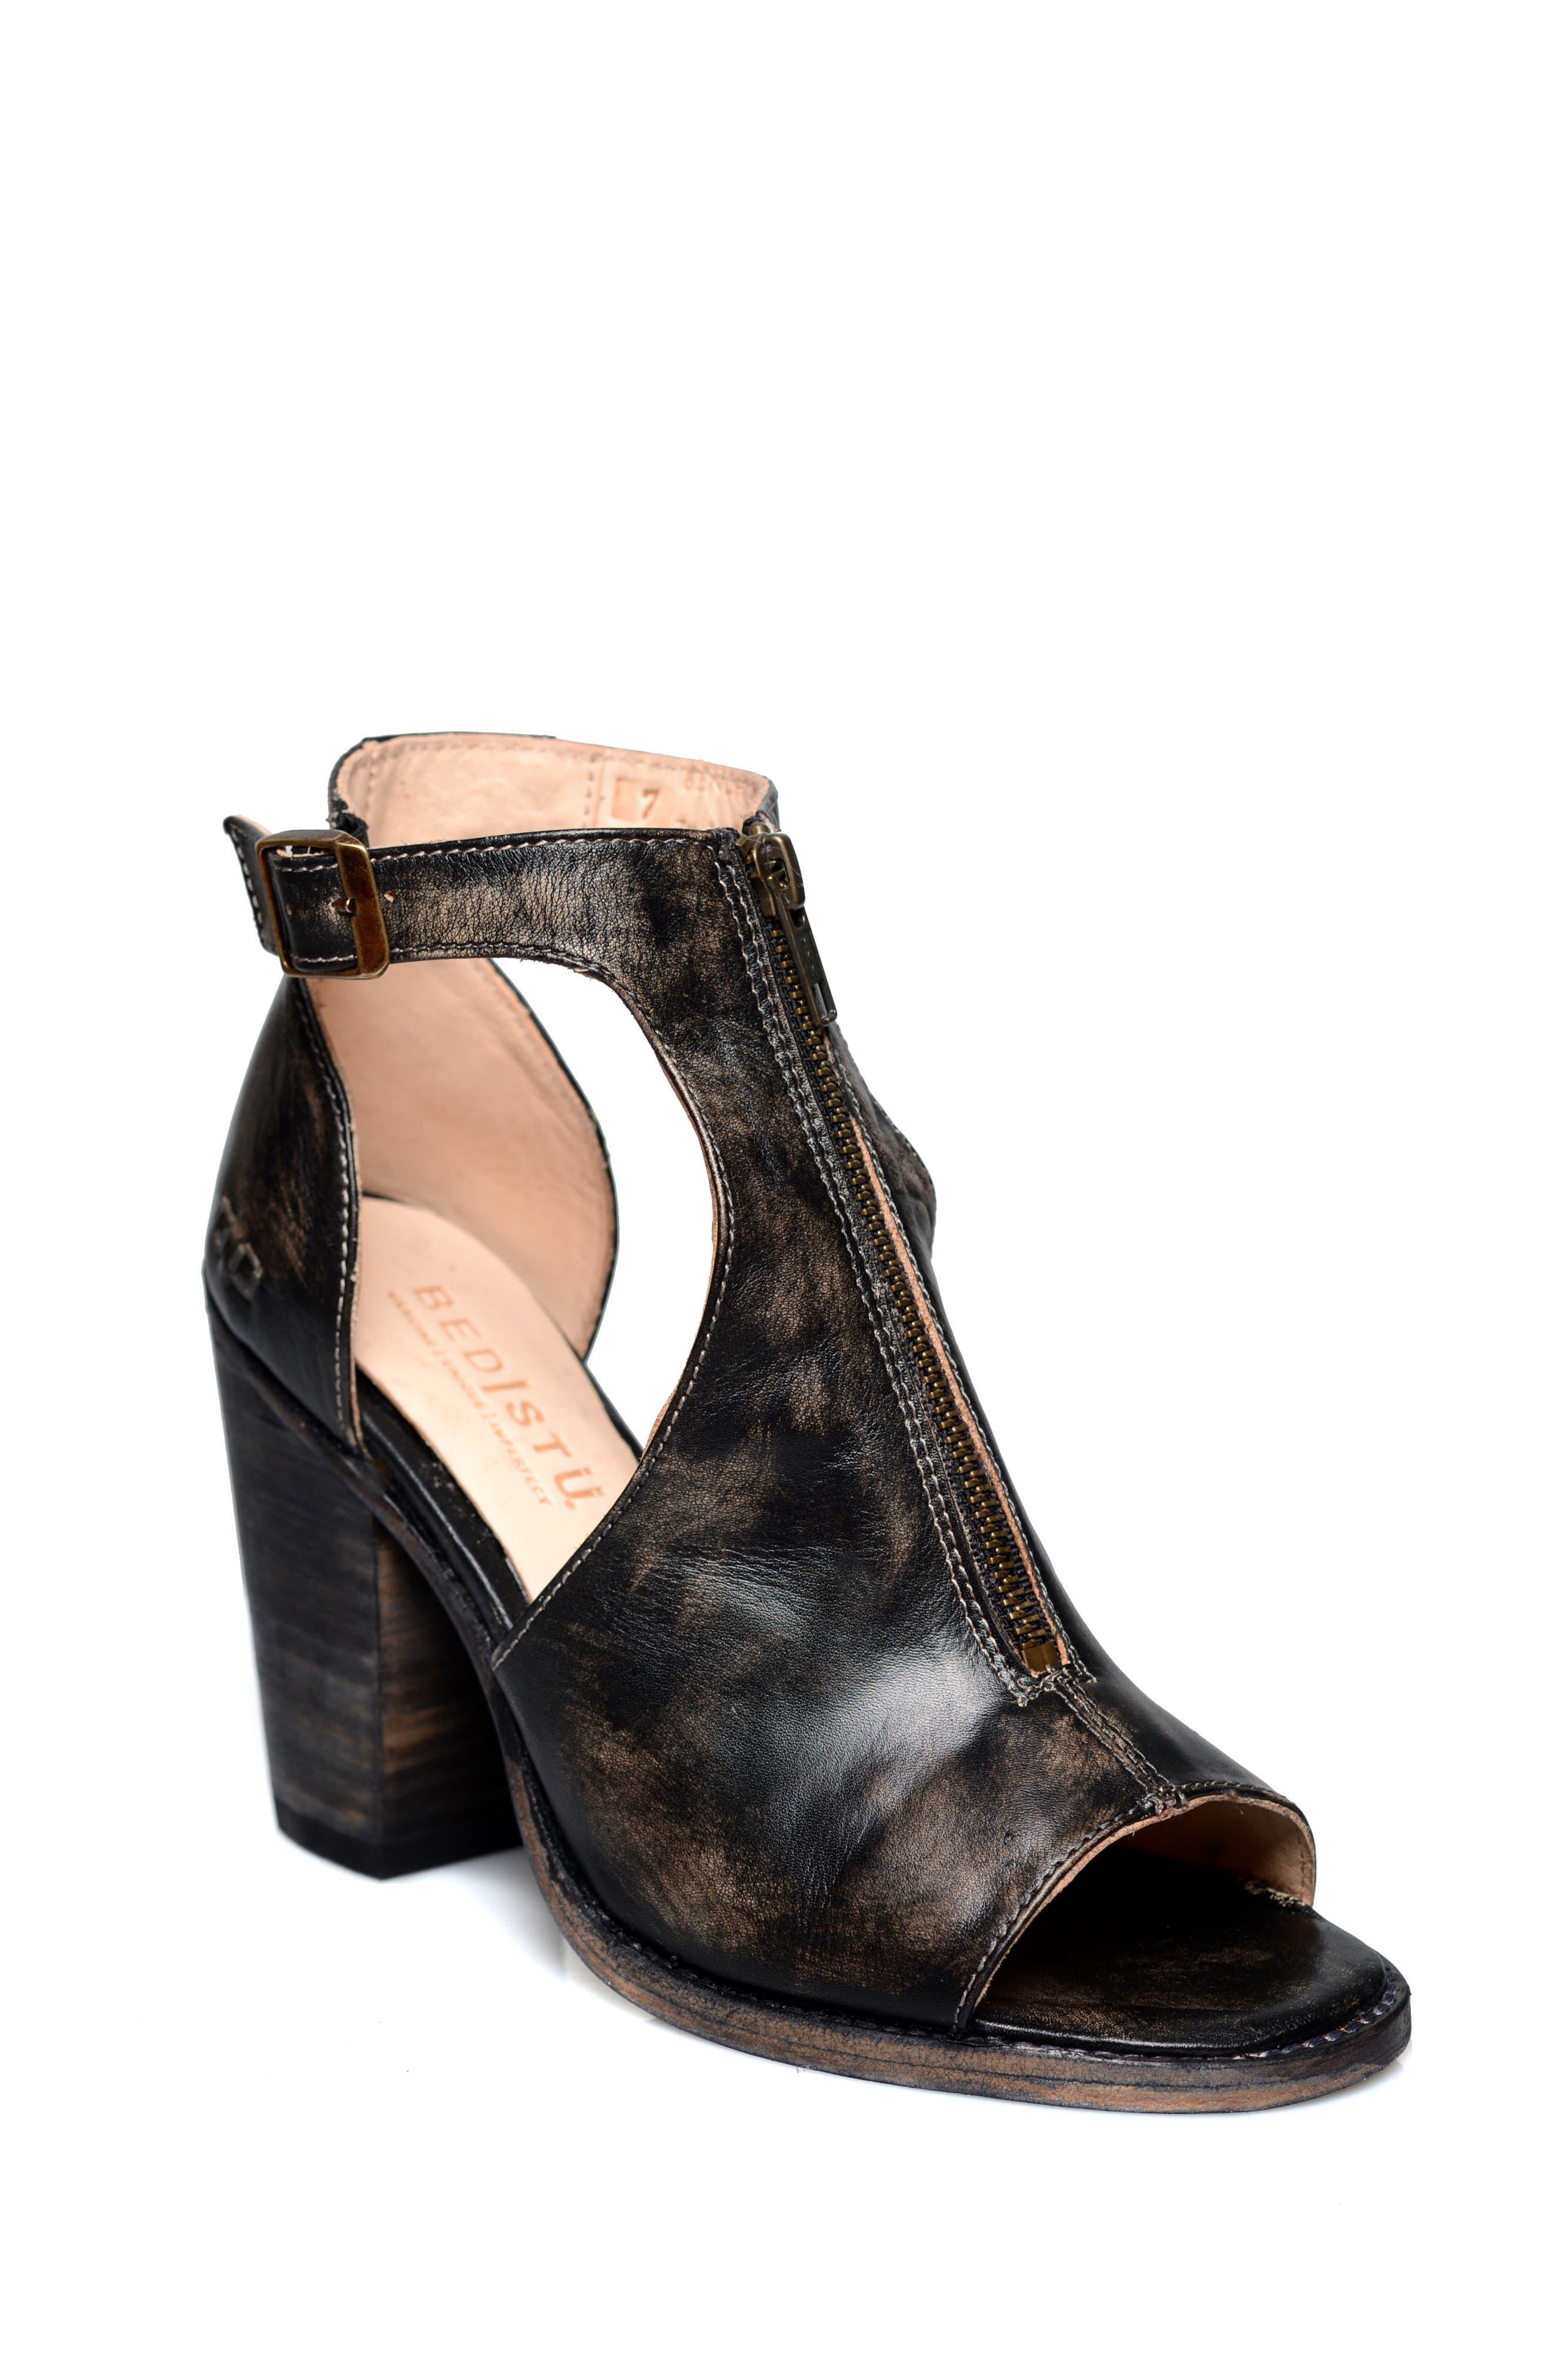 Olena Open Toe Bootie,                             Main thumbnail 1, color,                             Black Leather